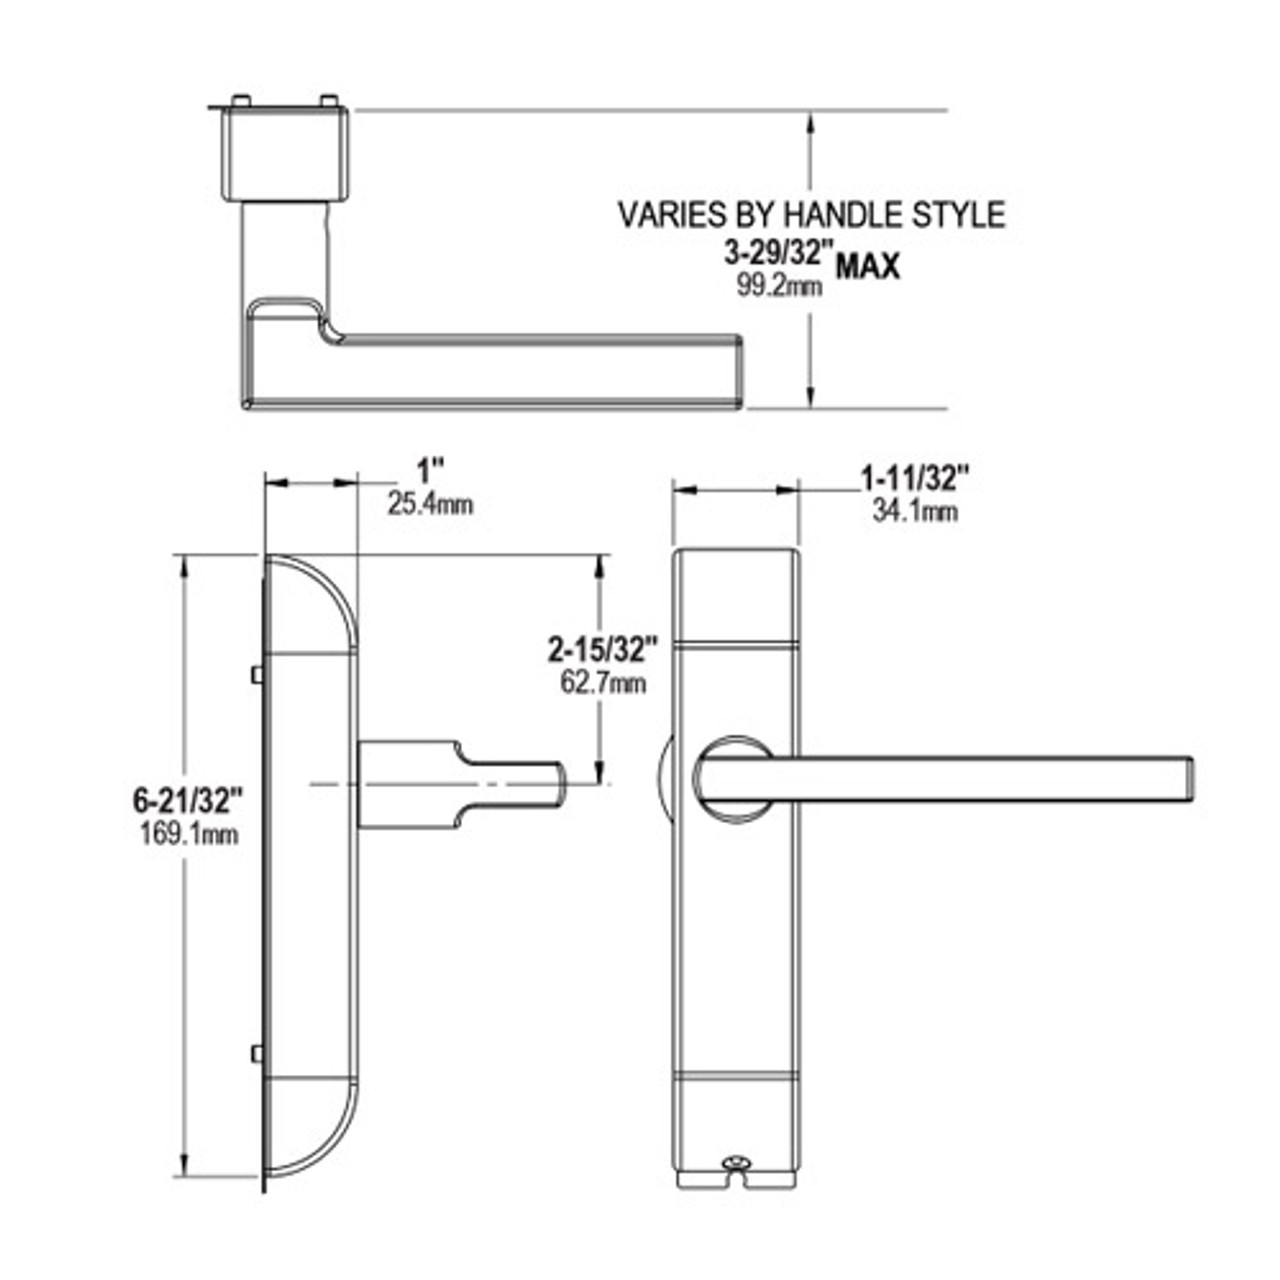 4600-MV-642-US3 Adams Rite MV Designer handle Dimensional View